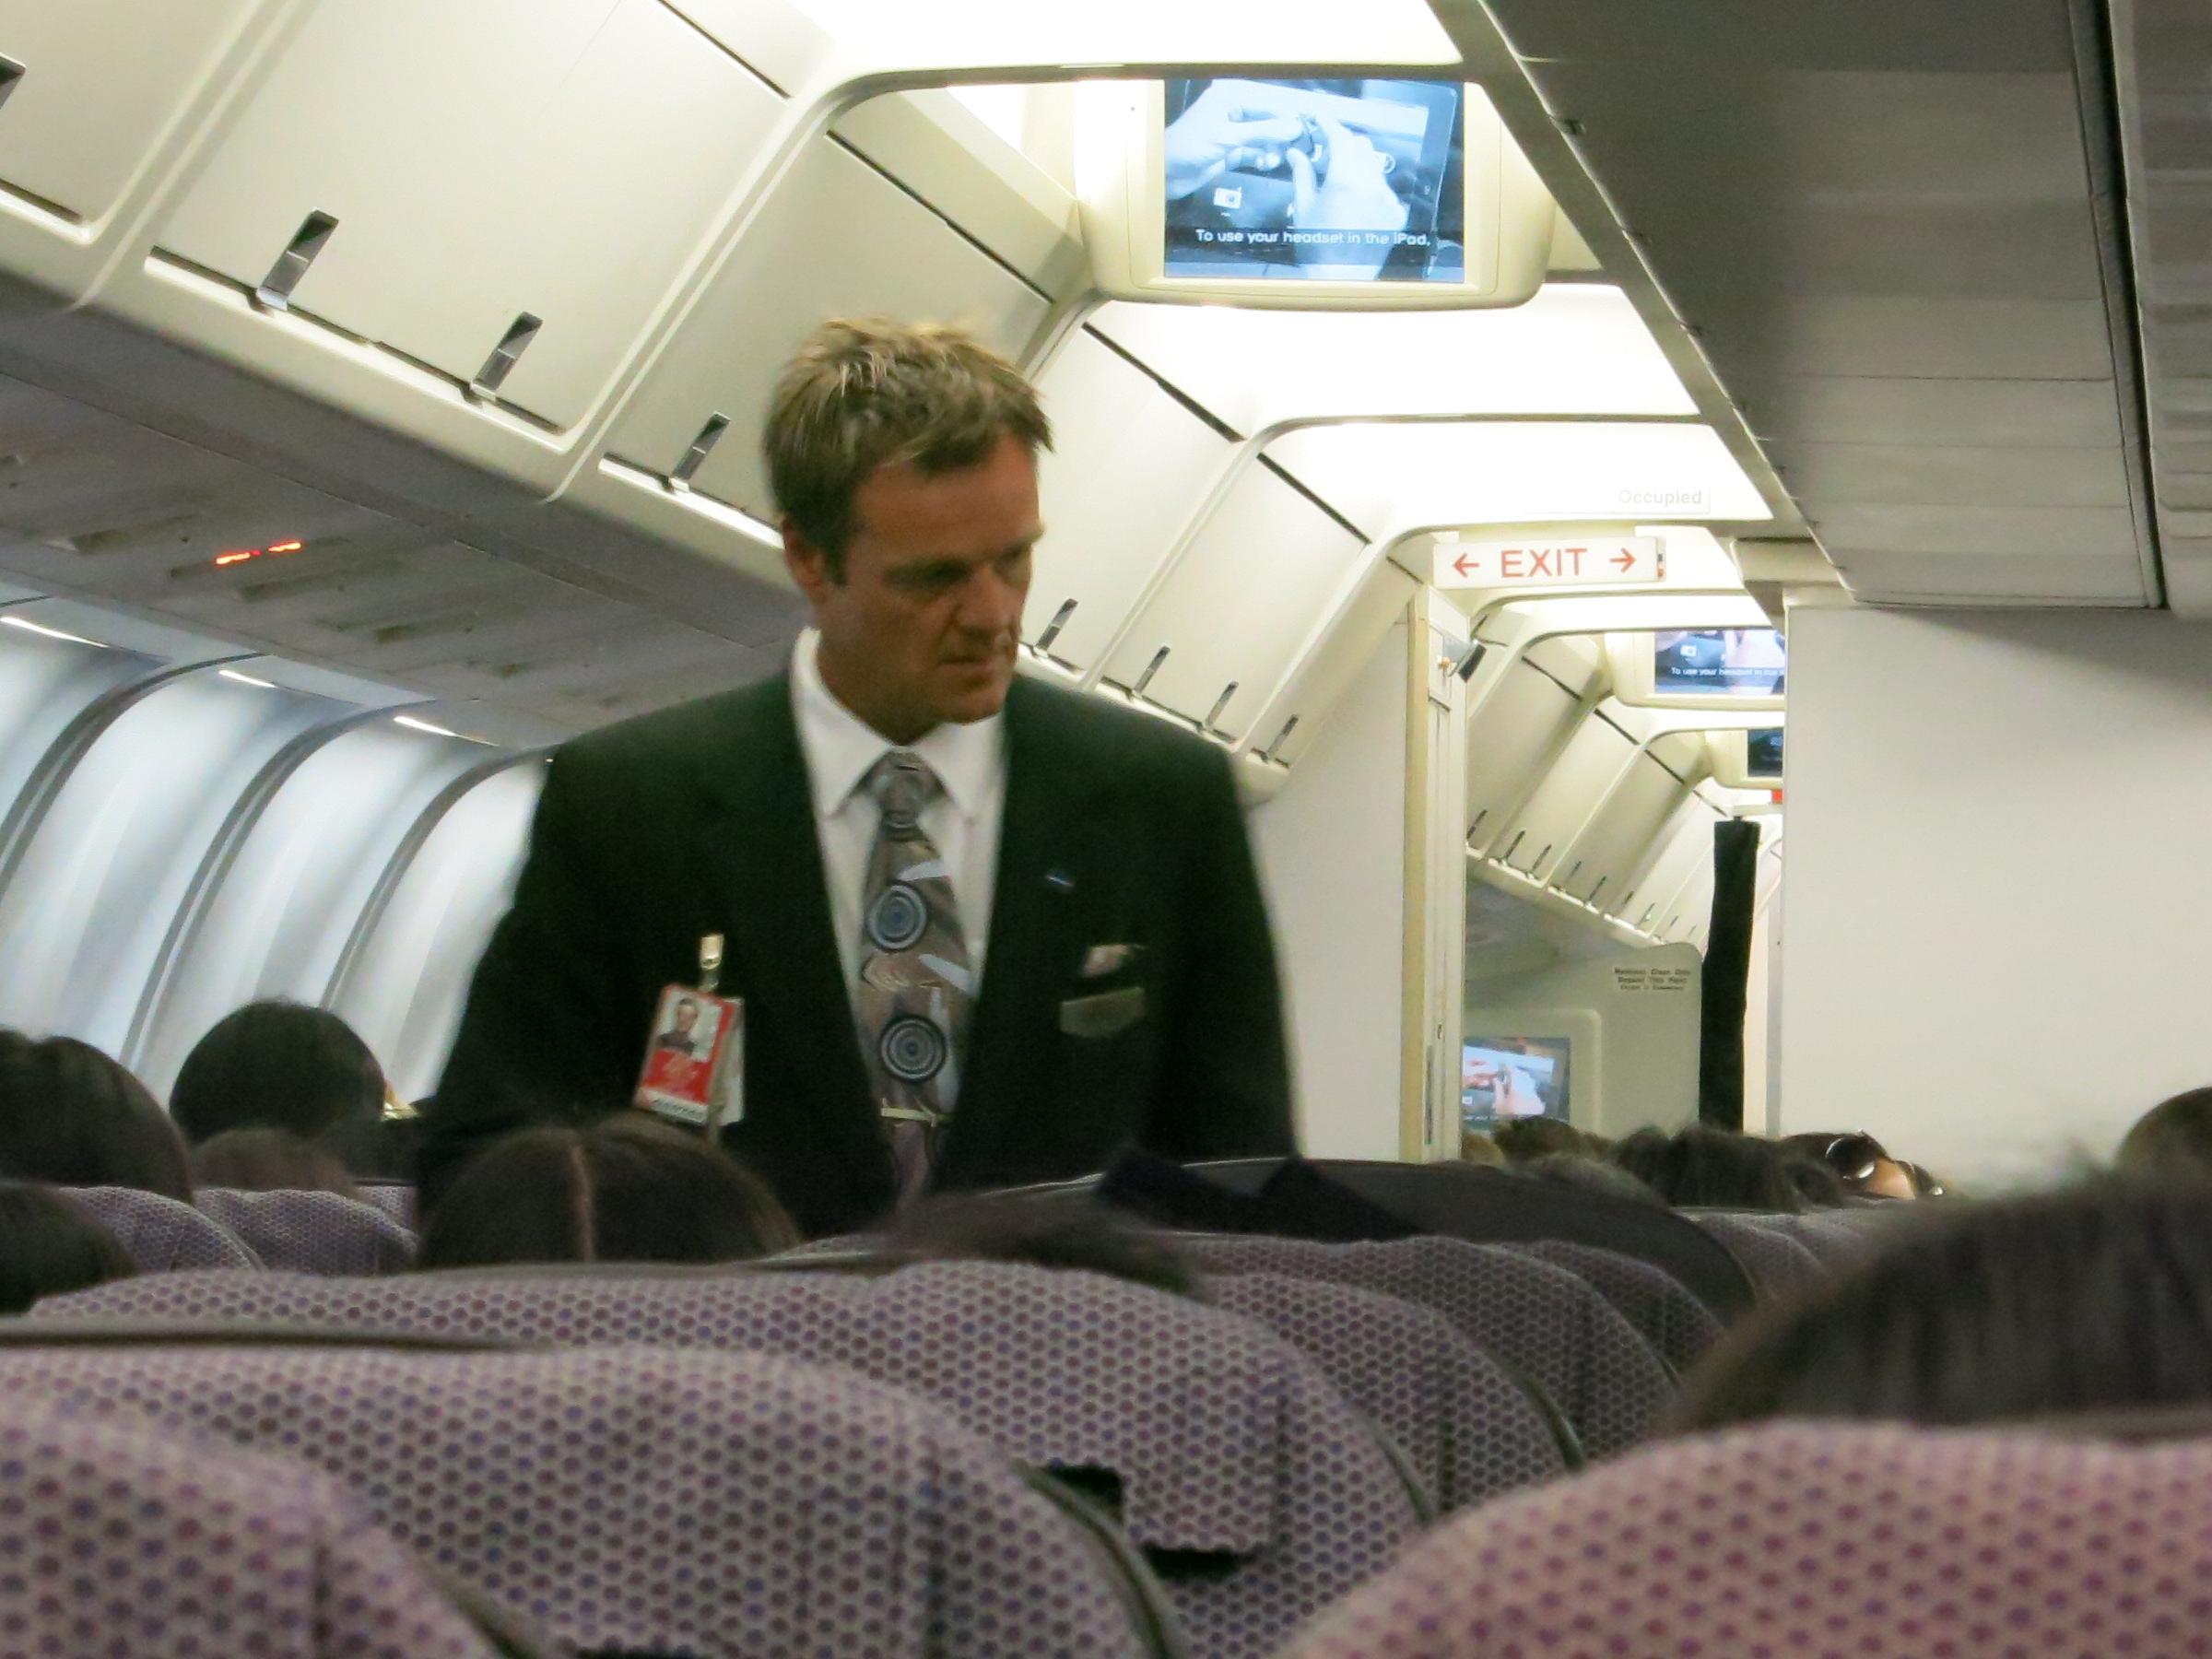 Flight Attendants Reveal 19 Secrets That Airlines DON'T Want